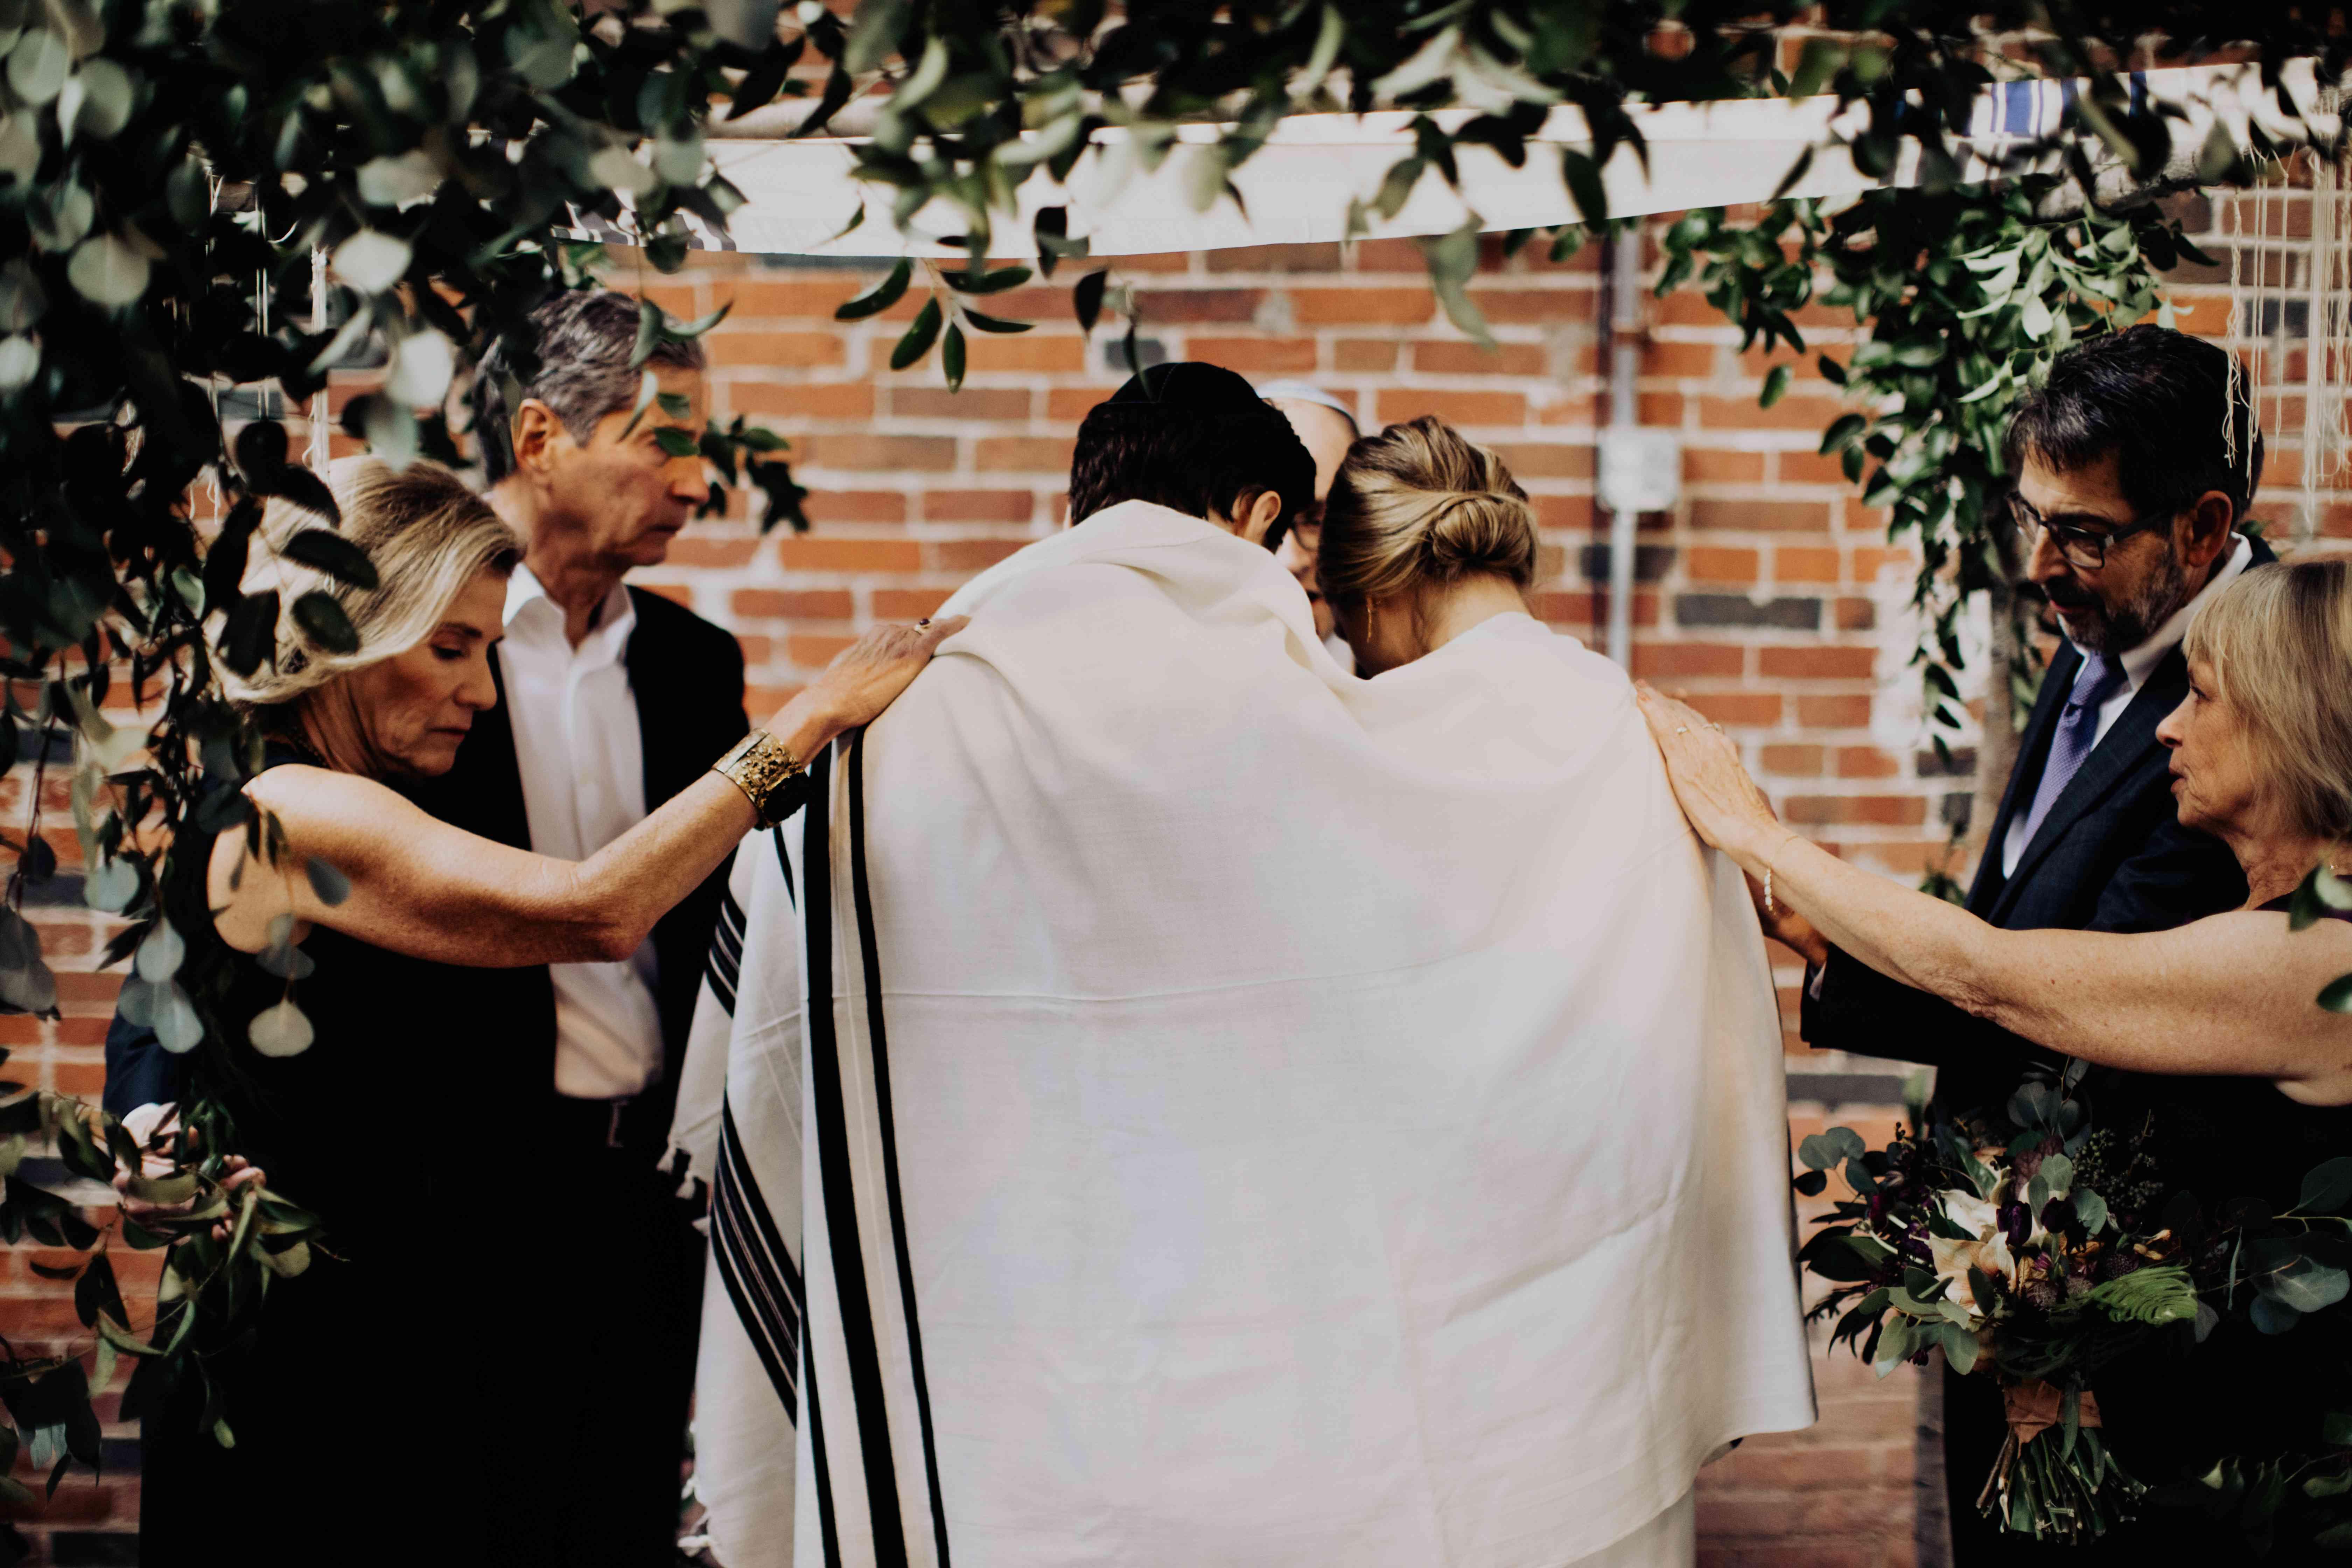 <p>jewish wedding traditions</p><br><br>